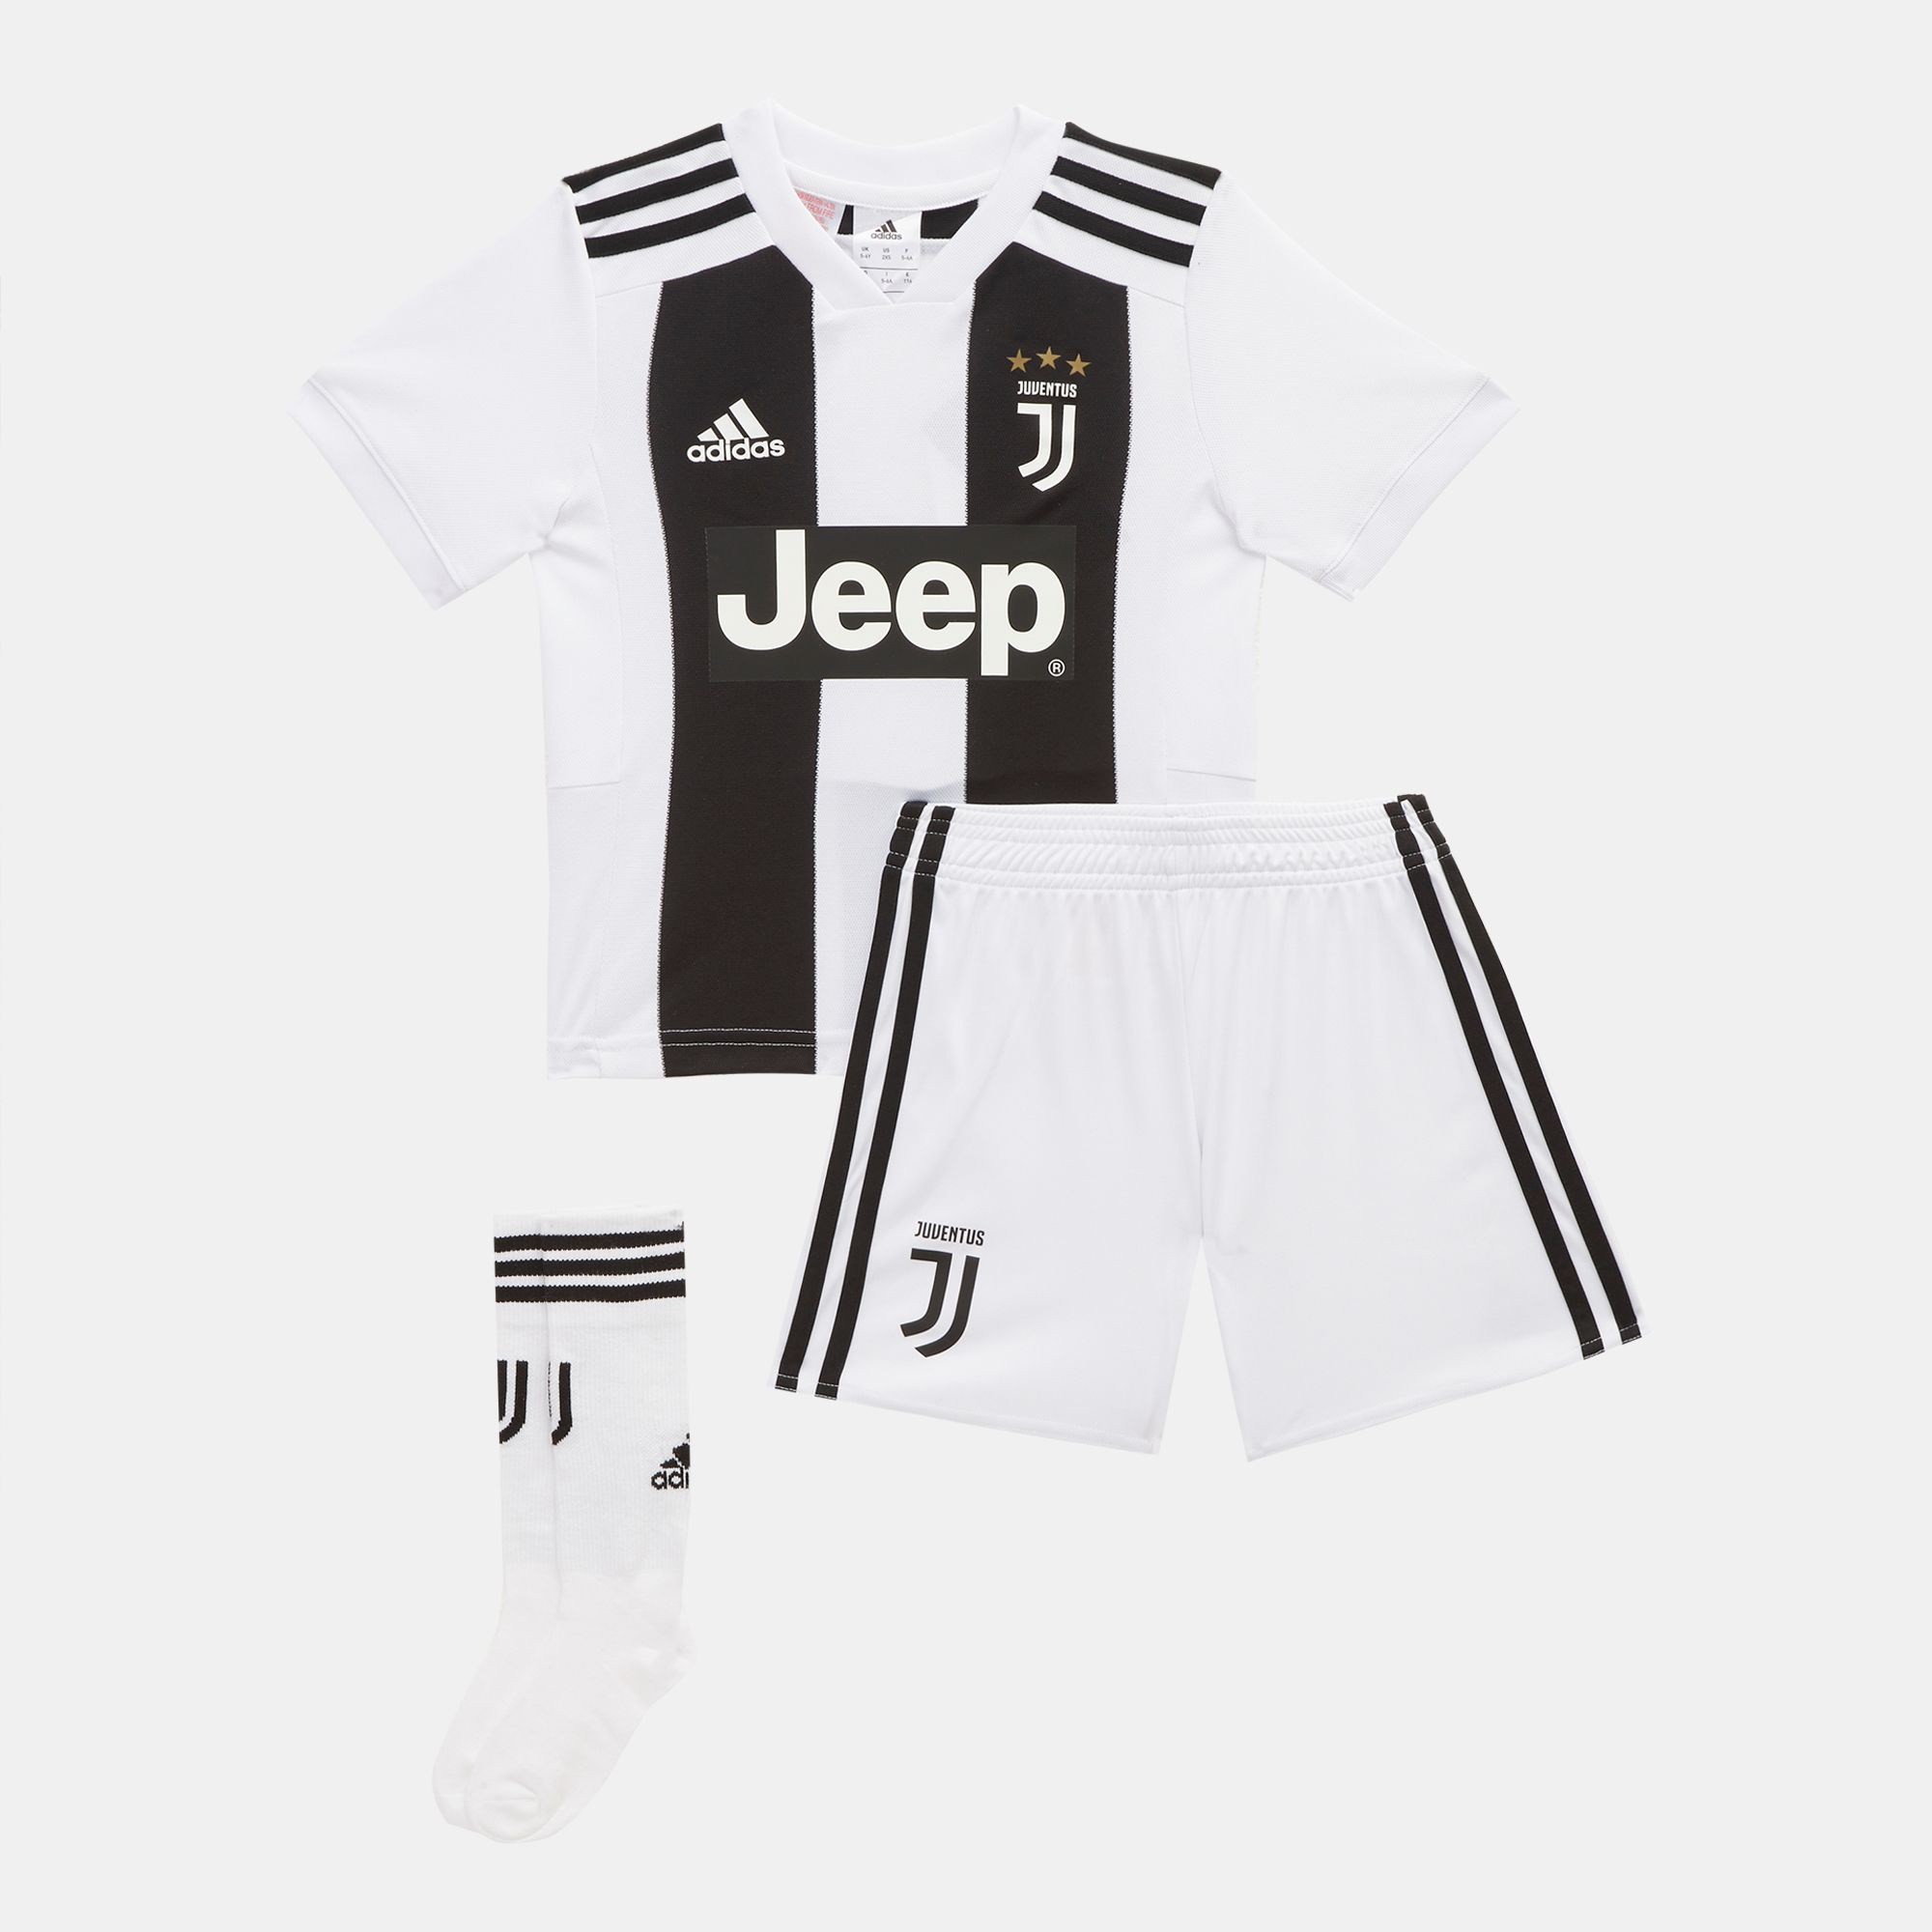 c4c37eccd adidas Kids  Juventus Mini Home Football Kit - 2018 19